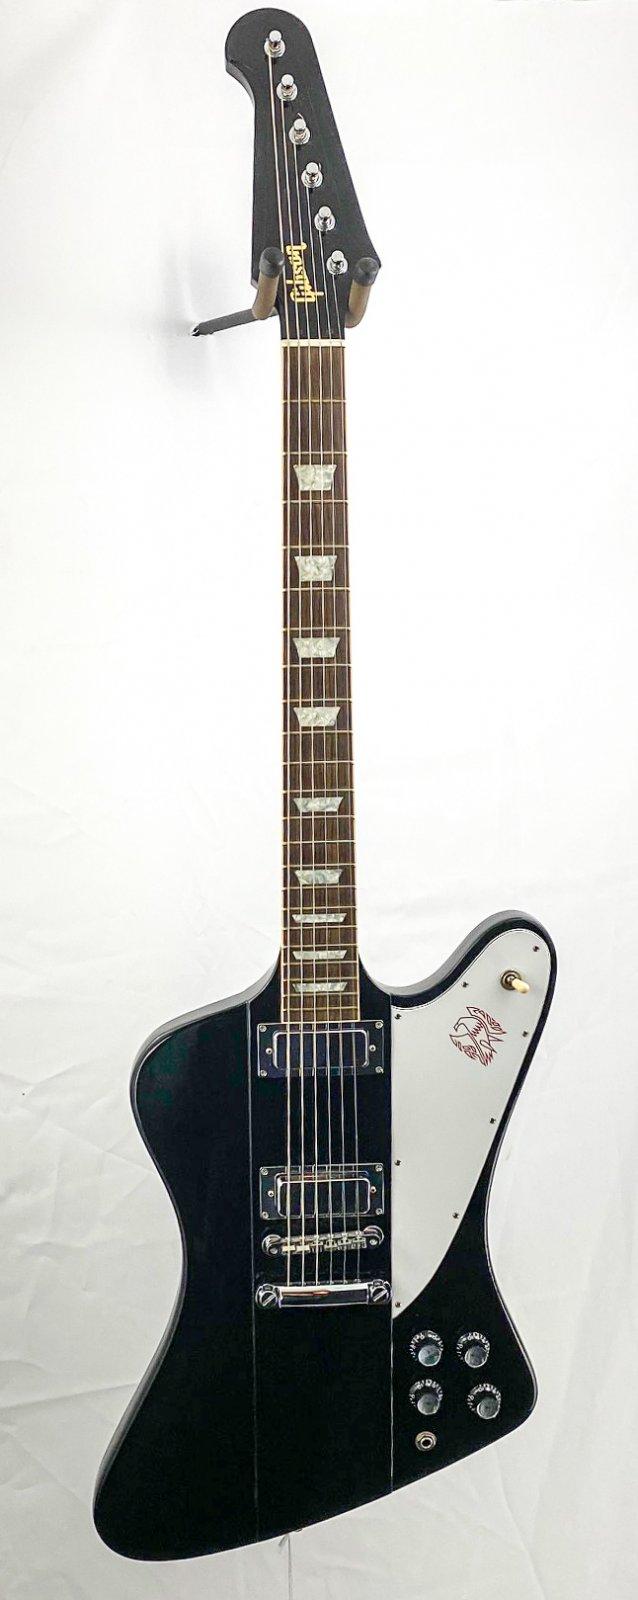 2003 Gibson Firebird V